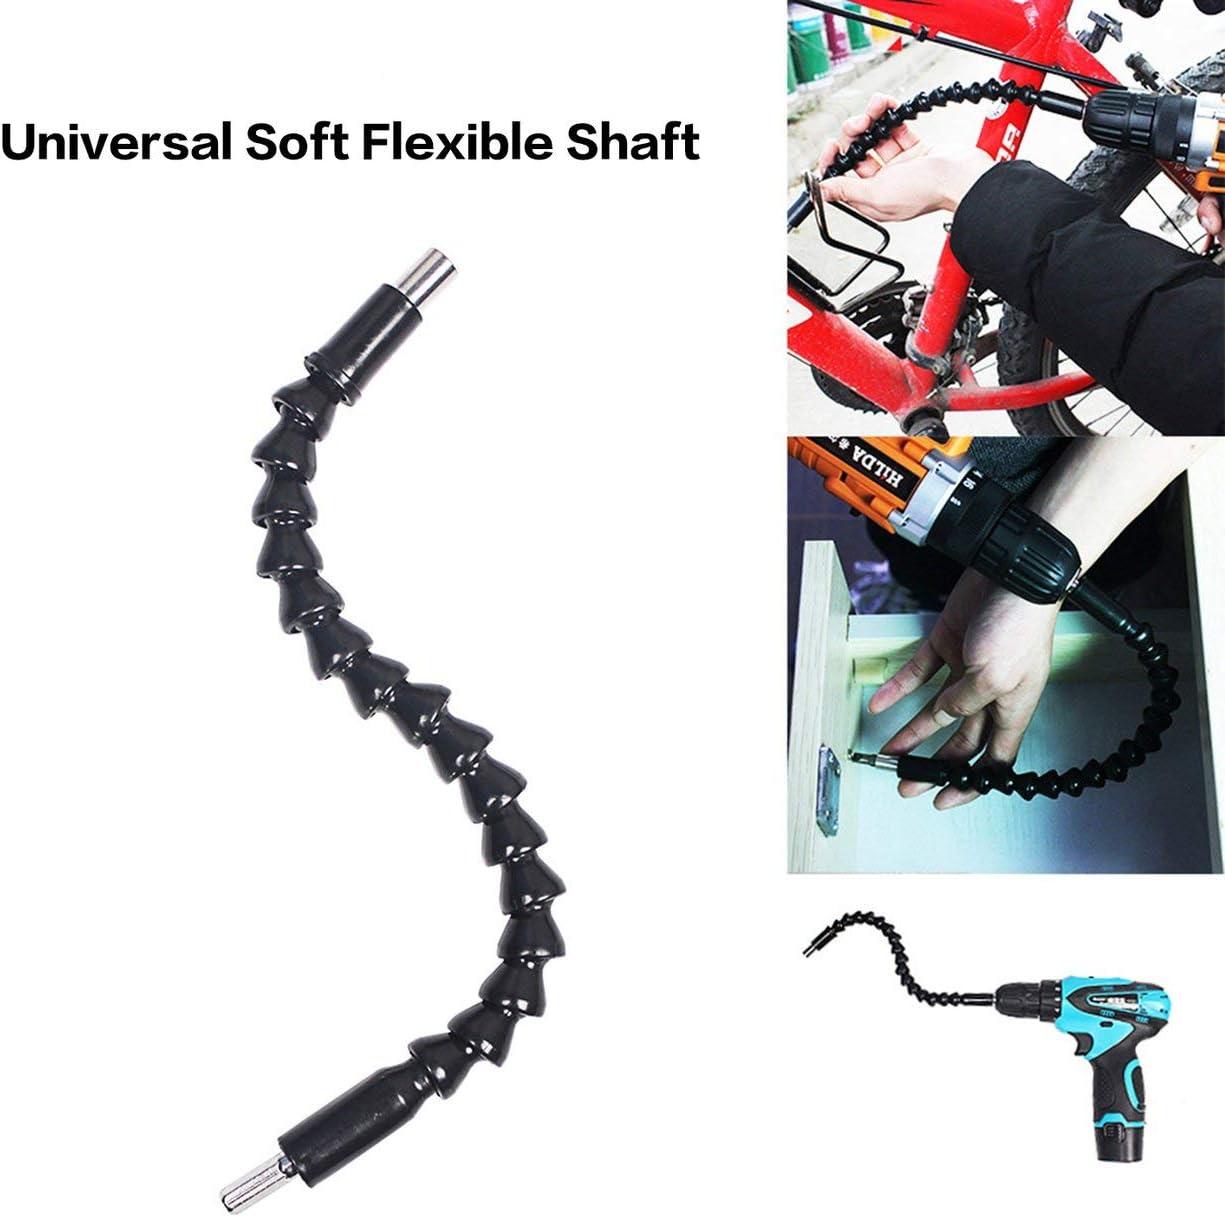 JIUY Electric Drill Flexible Shaft Screwdriver Universal Soft Flexible Shaft Electric Screwdriver Batch Extension Drill Bit Holder Black